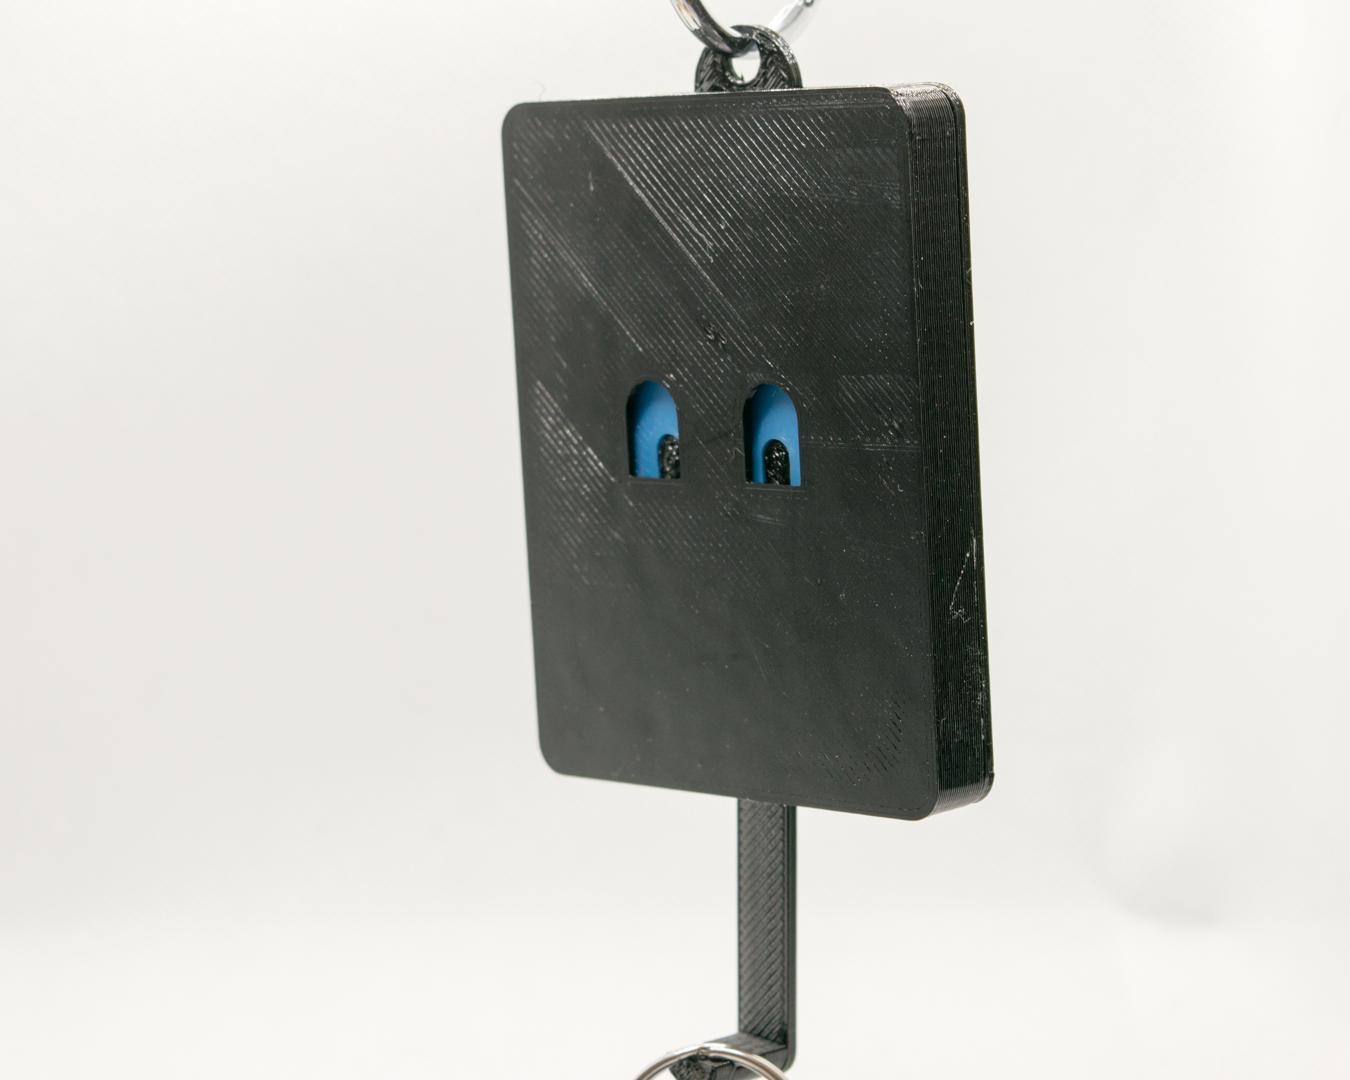 Schlüsselbrett, Keyguard, türkise Augen